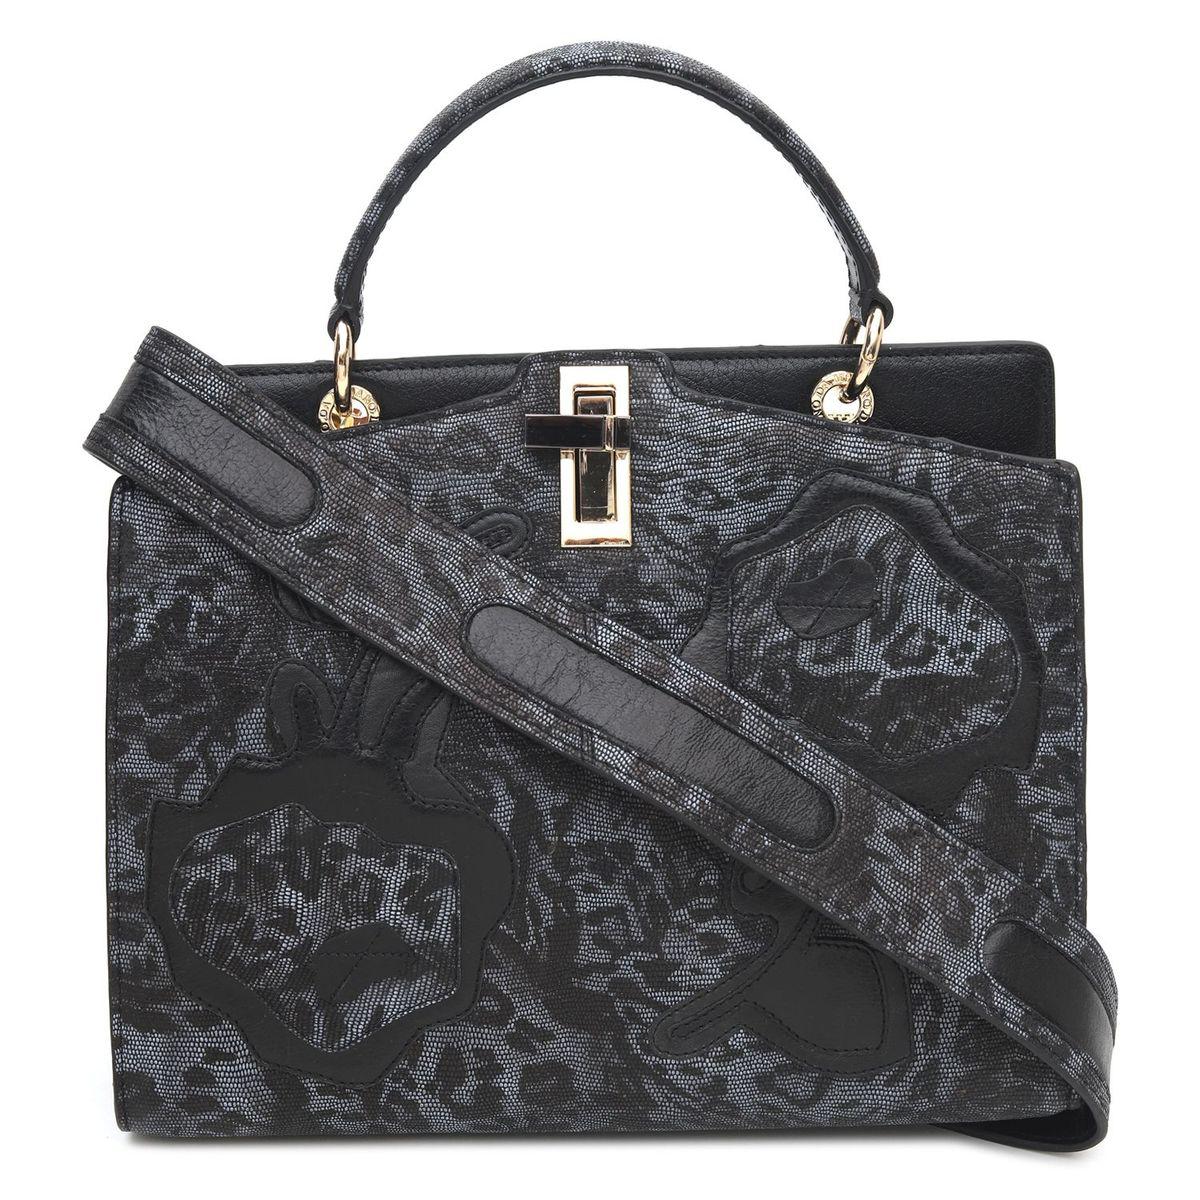 7f38437b2fdc ... Da Milano Black   Grey Satchel Bag · zoom ...